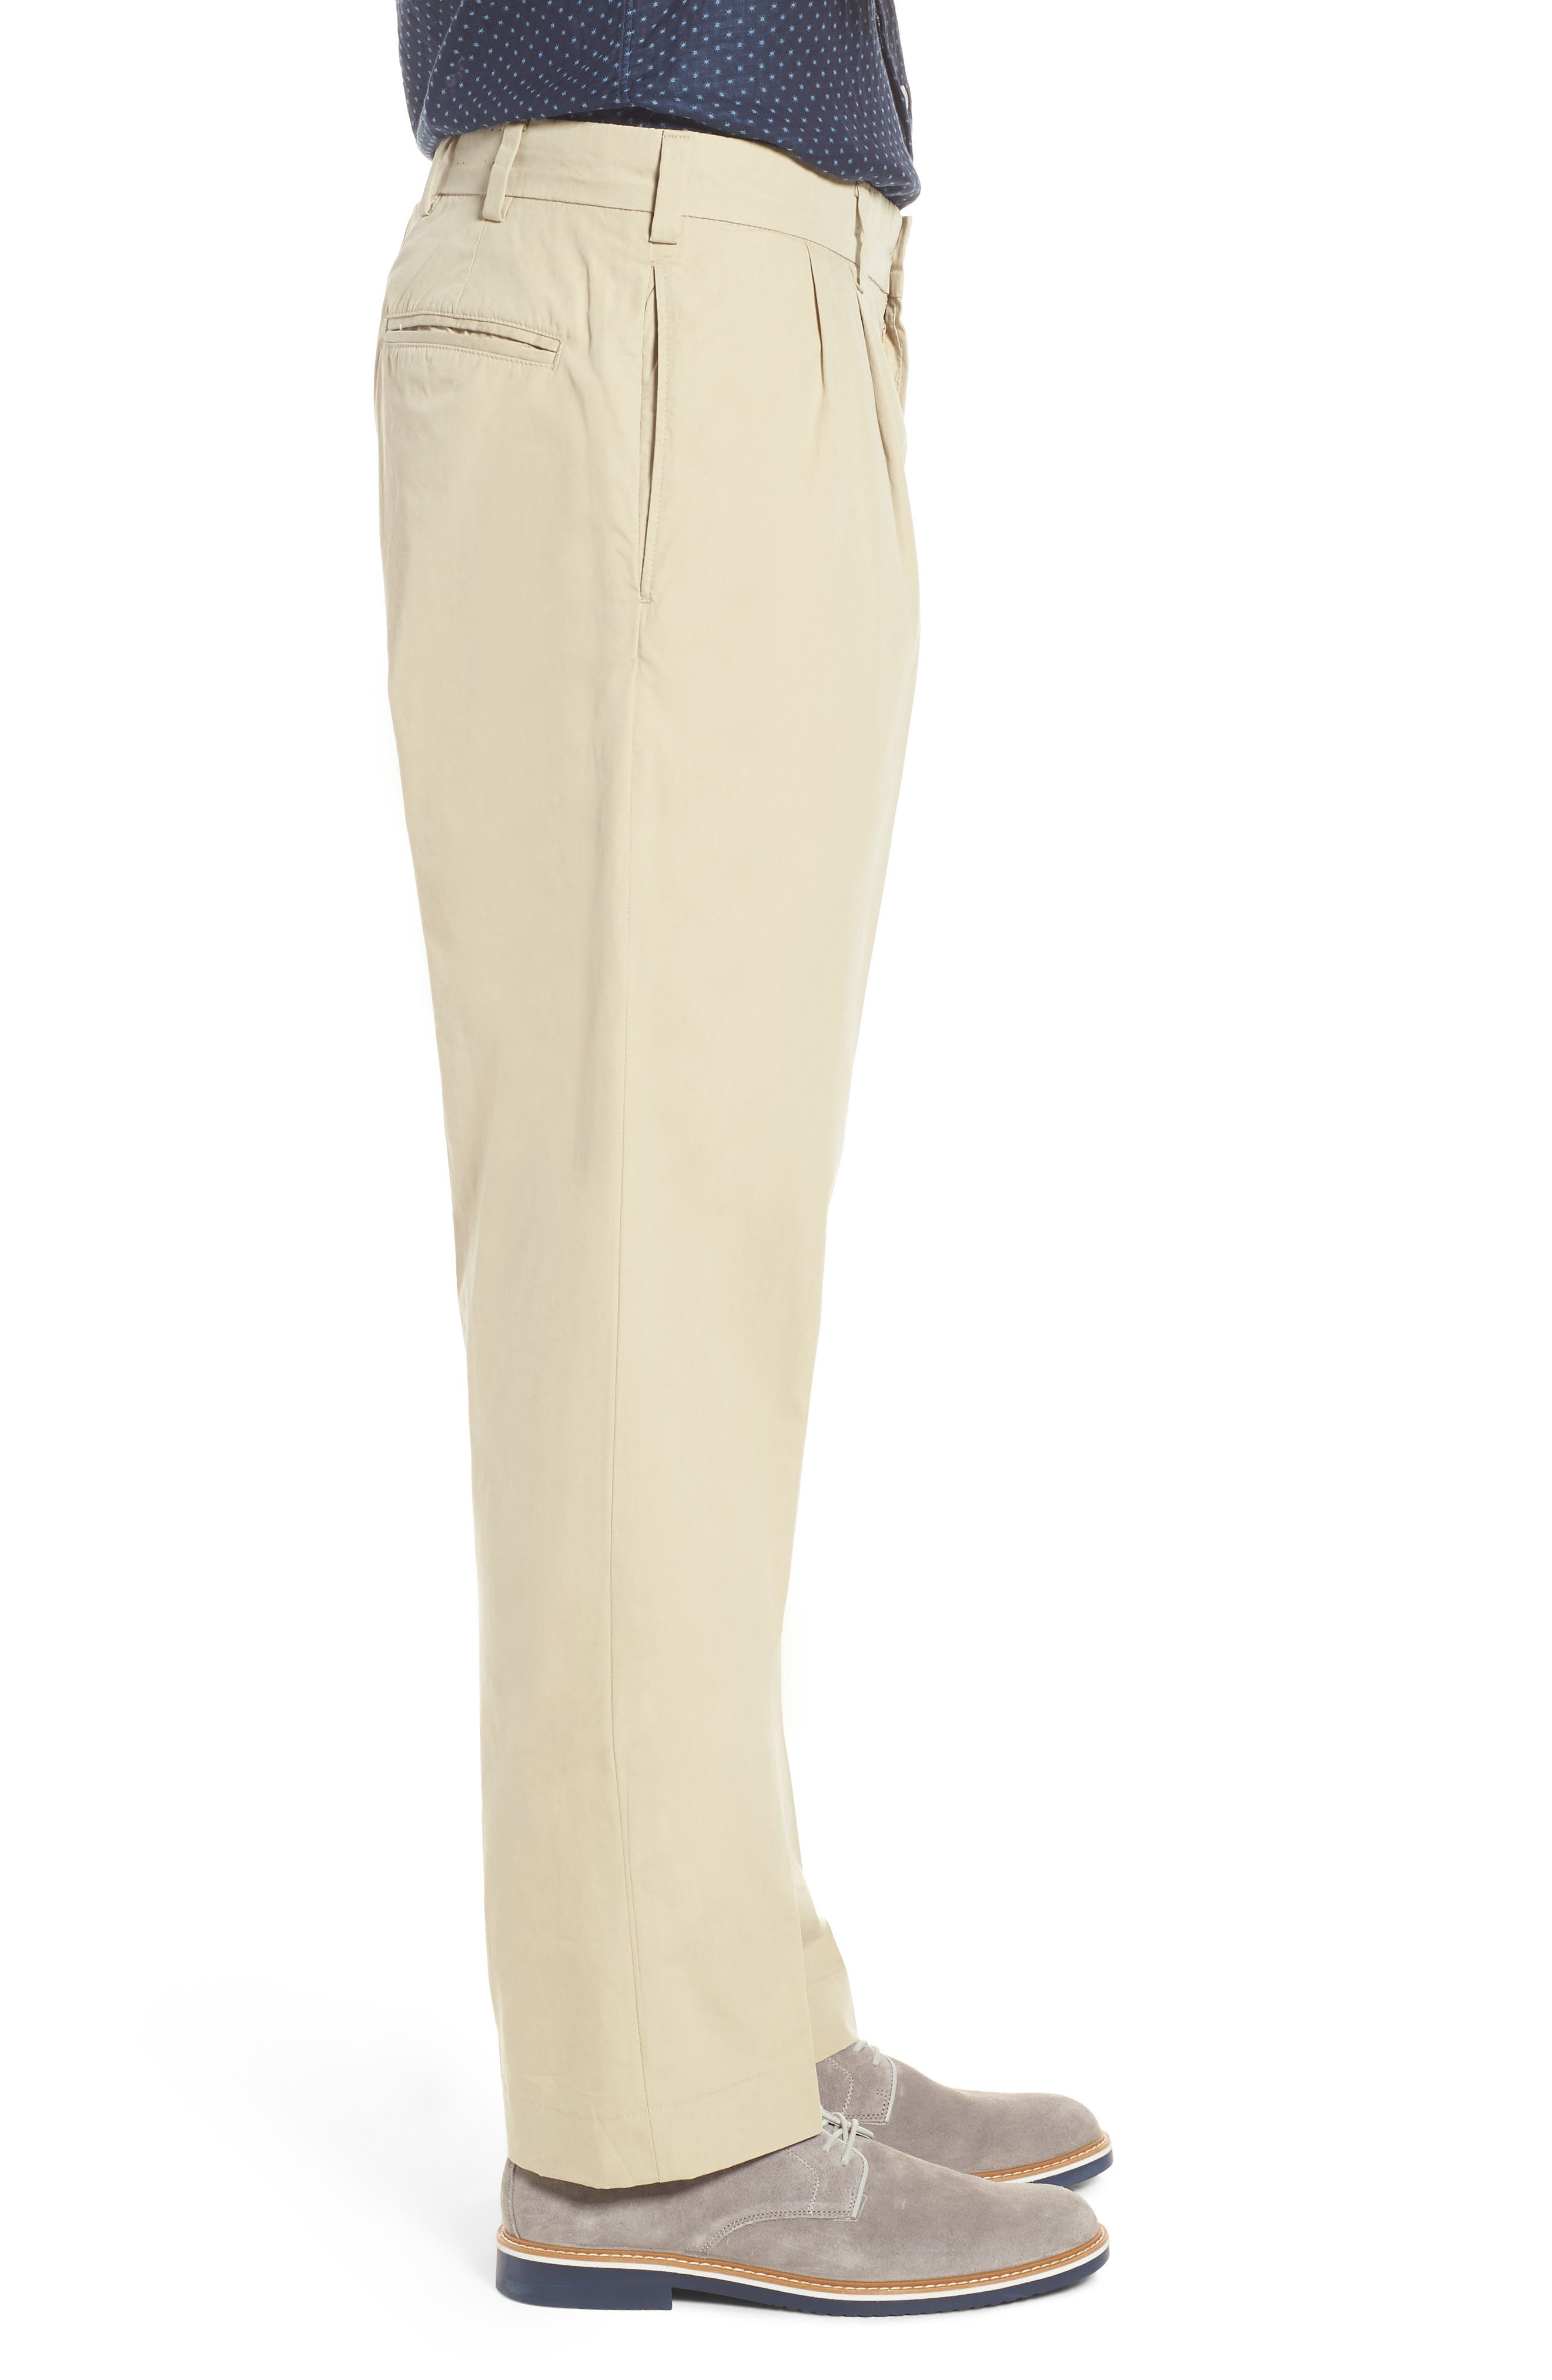 M2 Classic Fit Pleated Tropical Cotton Poplin Pants,                             Alternate thumbnail 3, color,                             Khaki